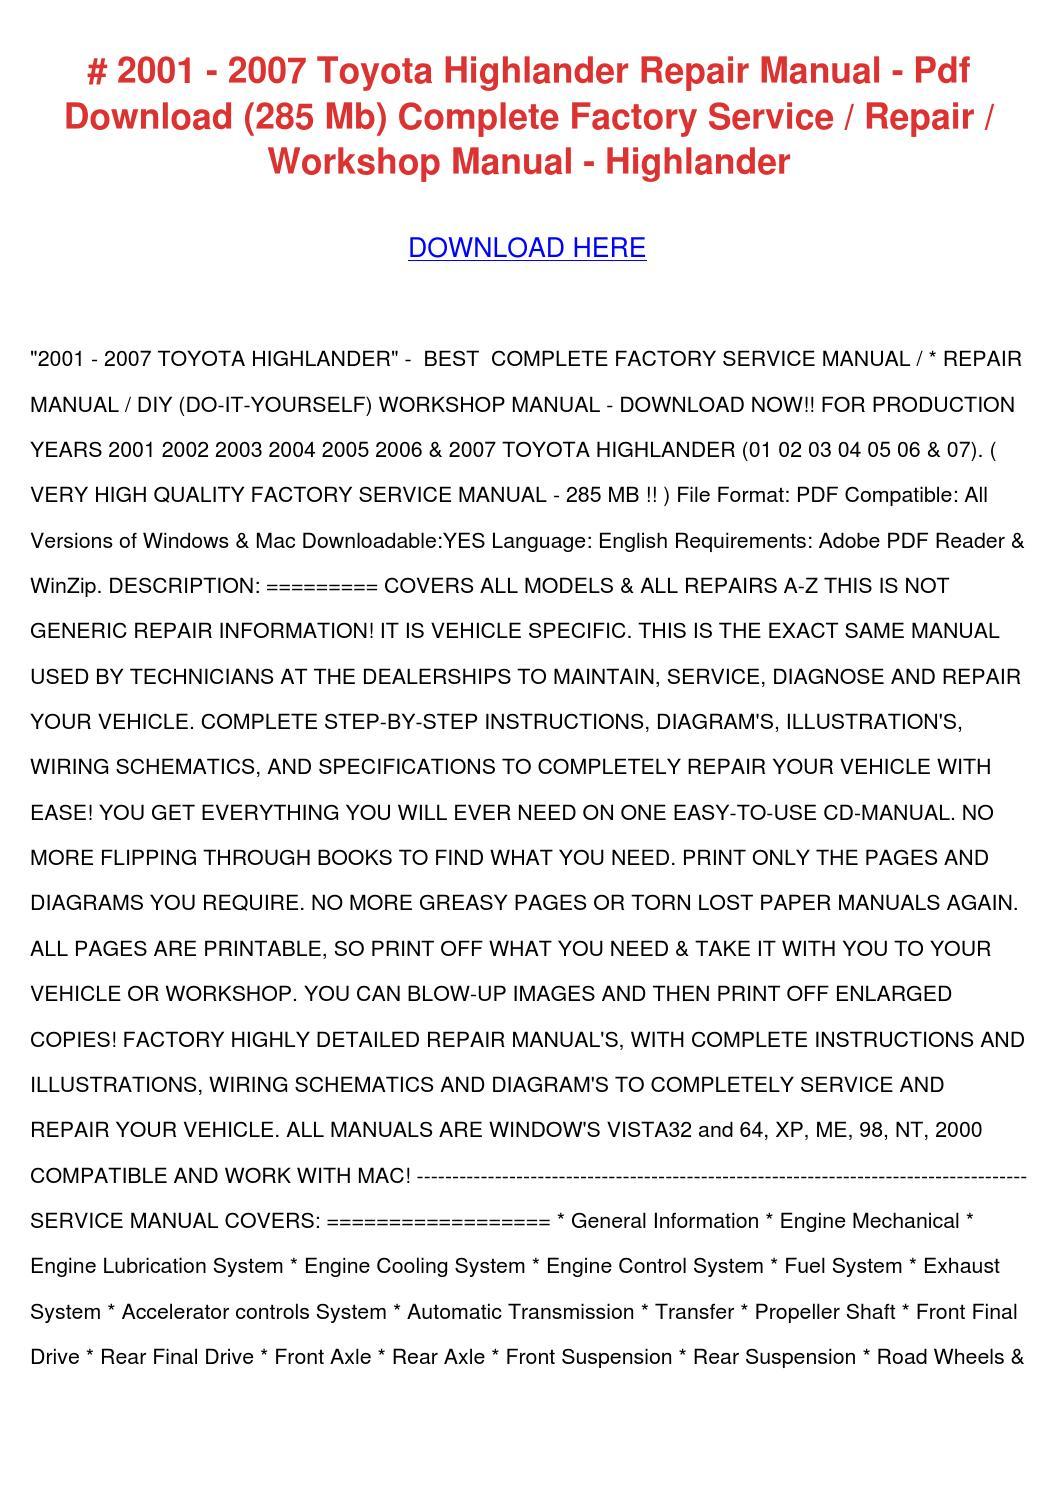 2002 Toyota Highlander Service Manual Pdf